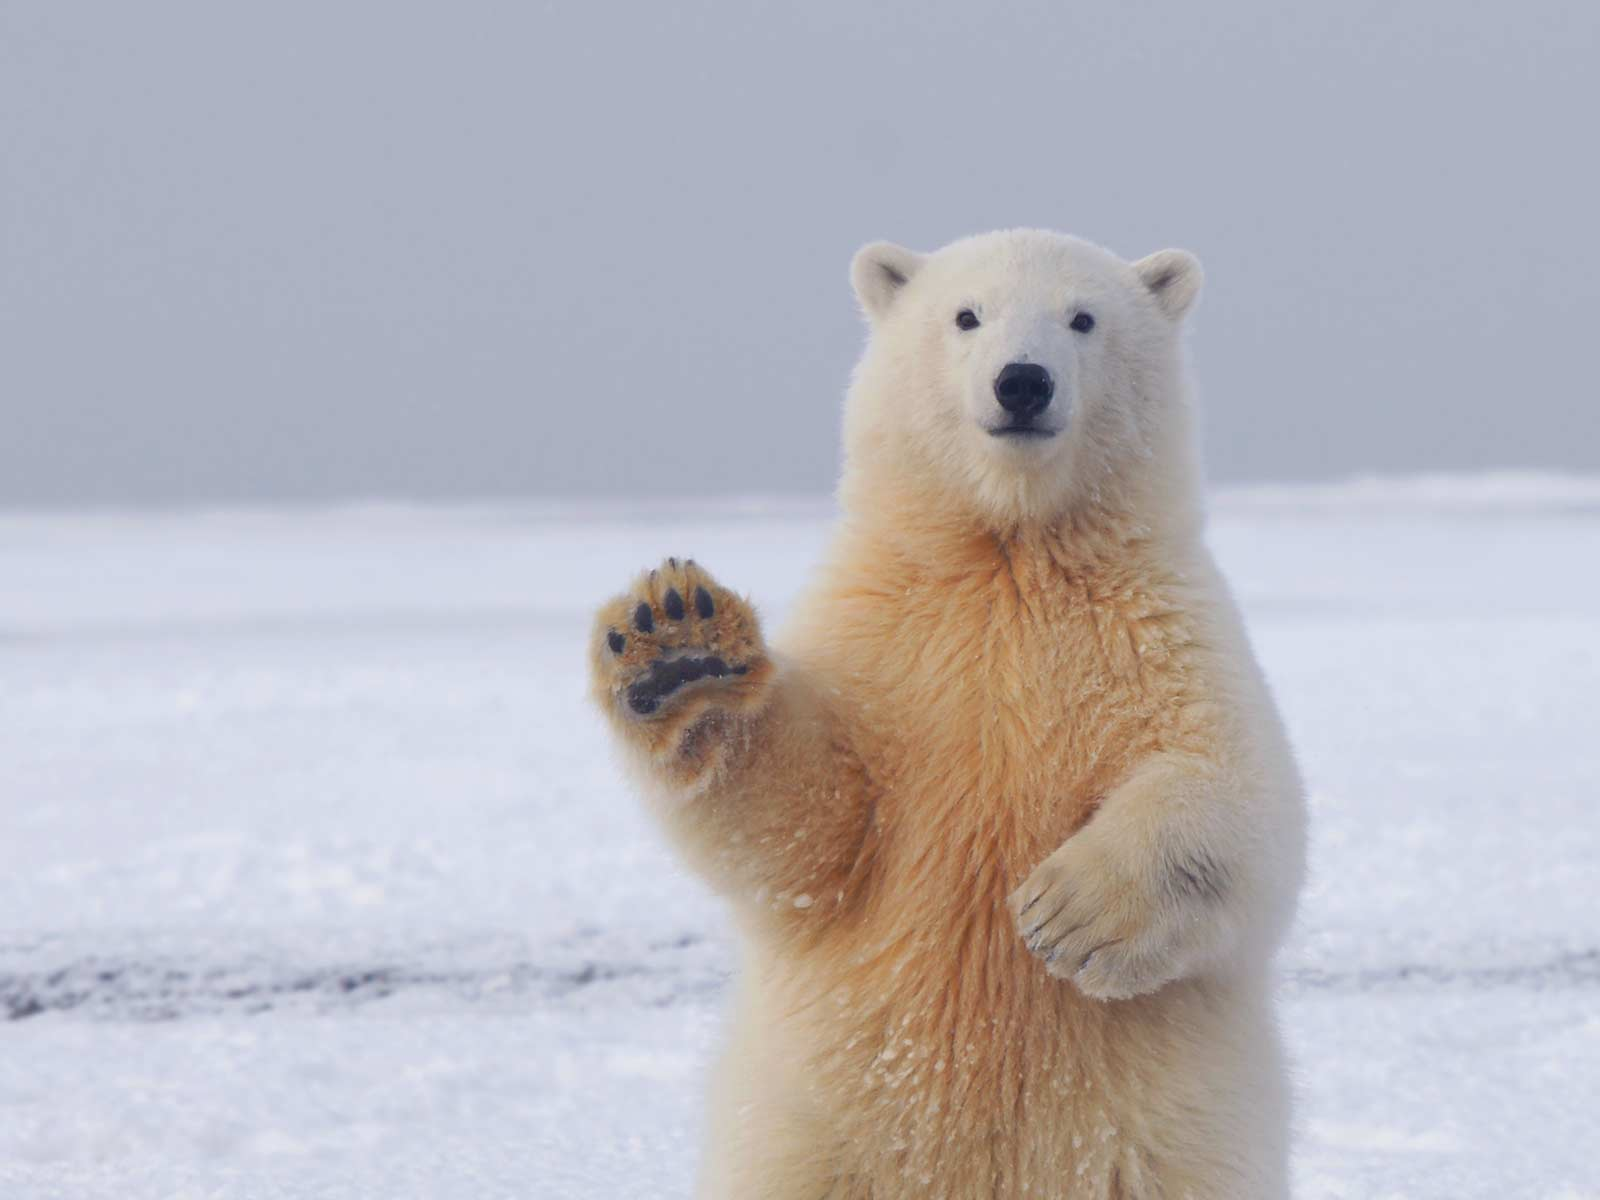 photo of a waving bear